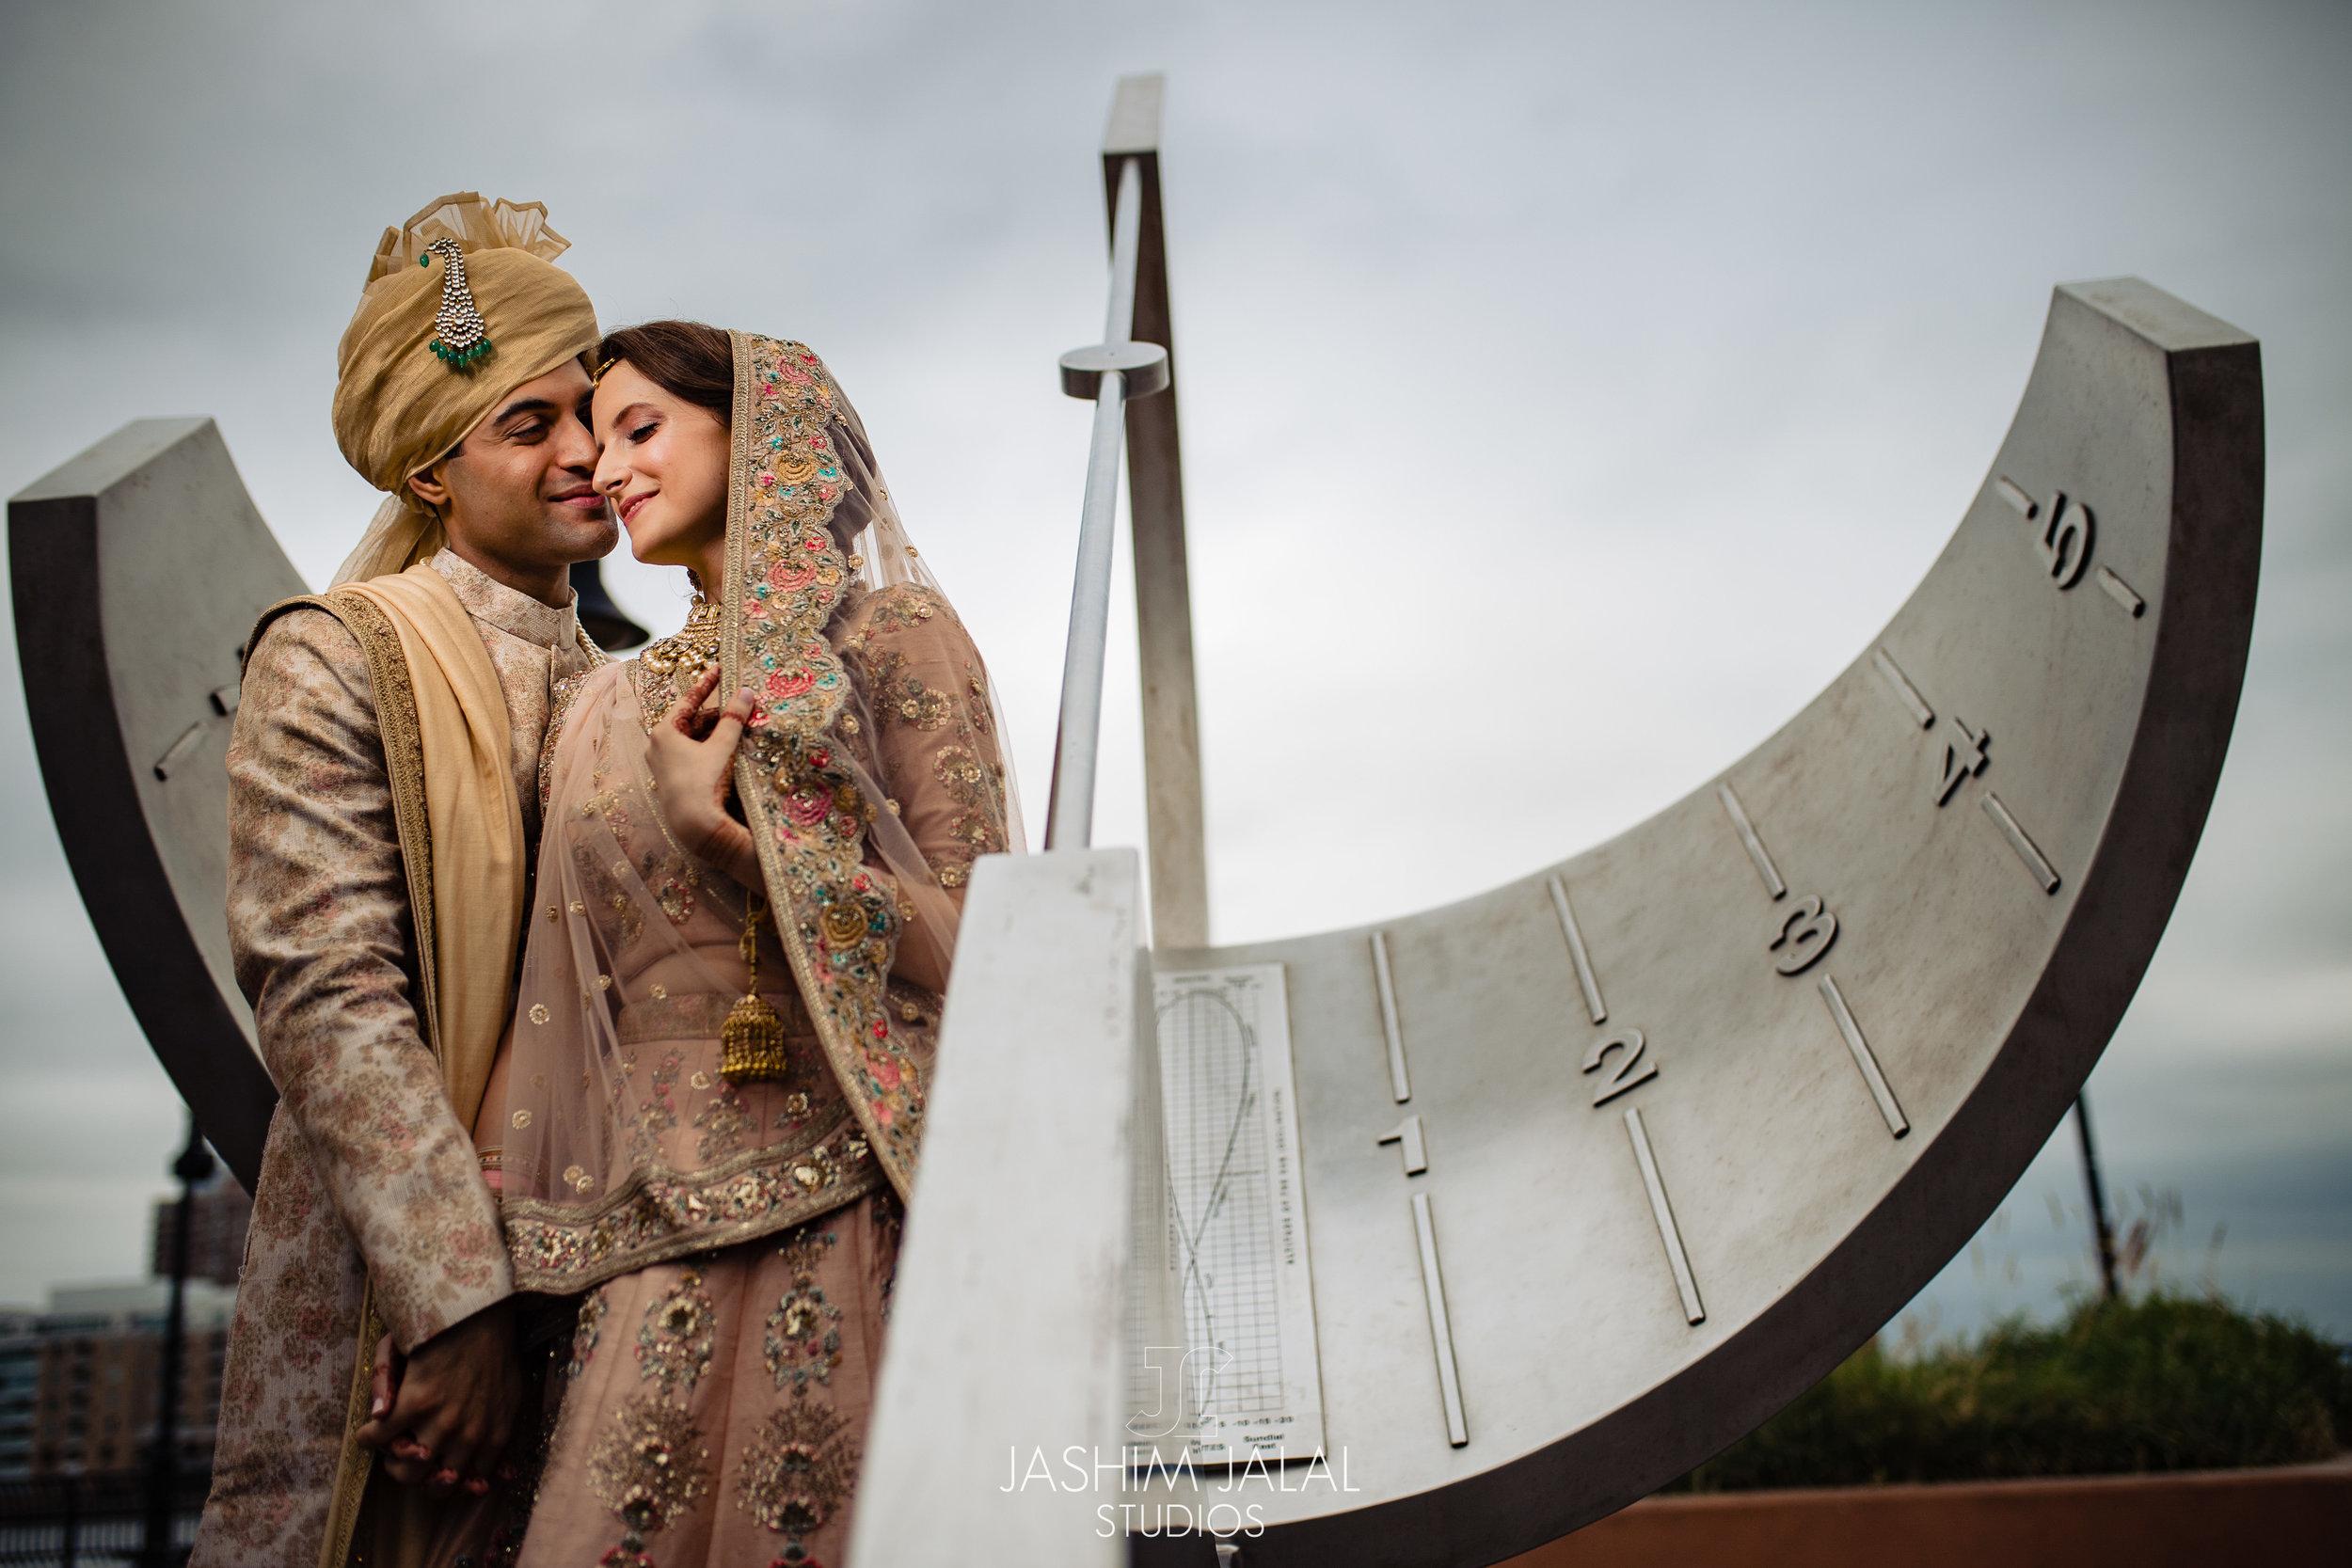 INDIAN WEDDING BRIDE AND GROOM WEDDING DAY.jpg